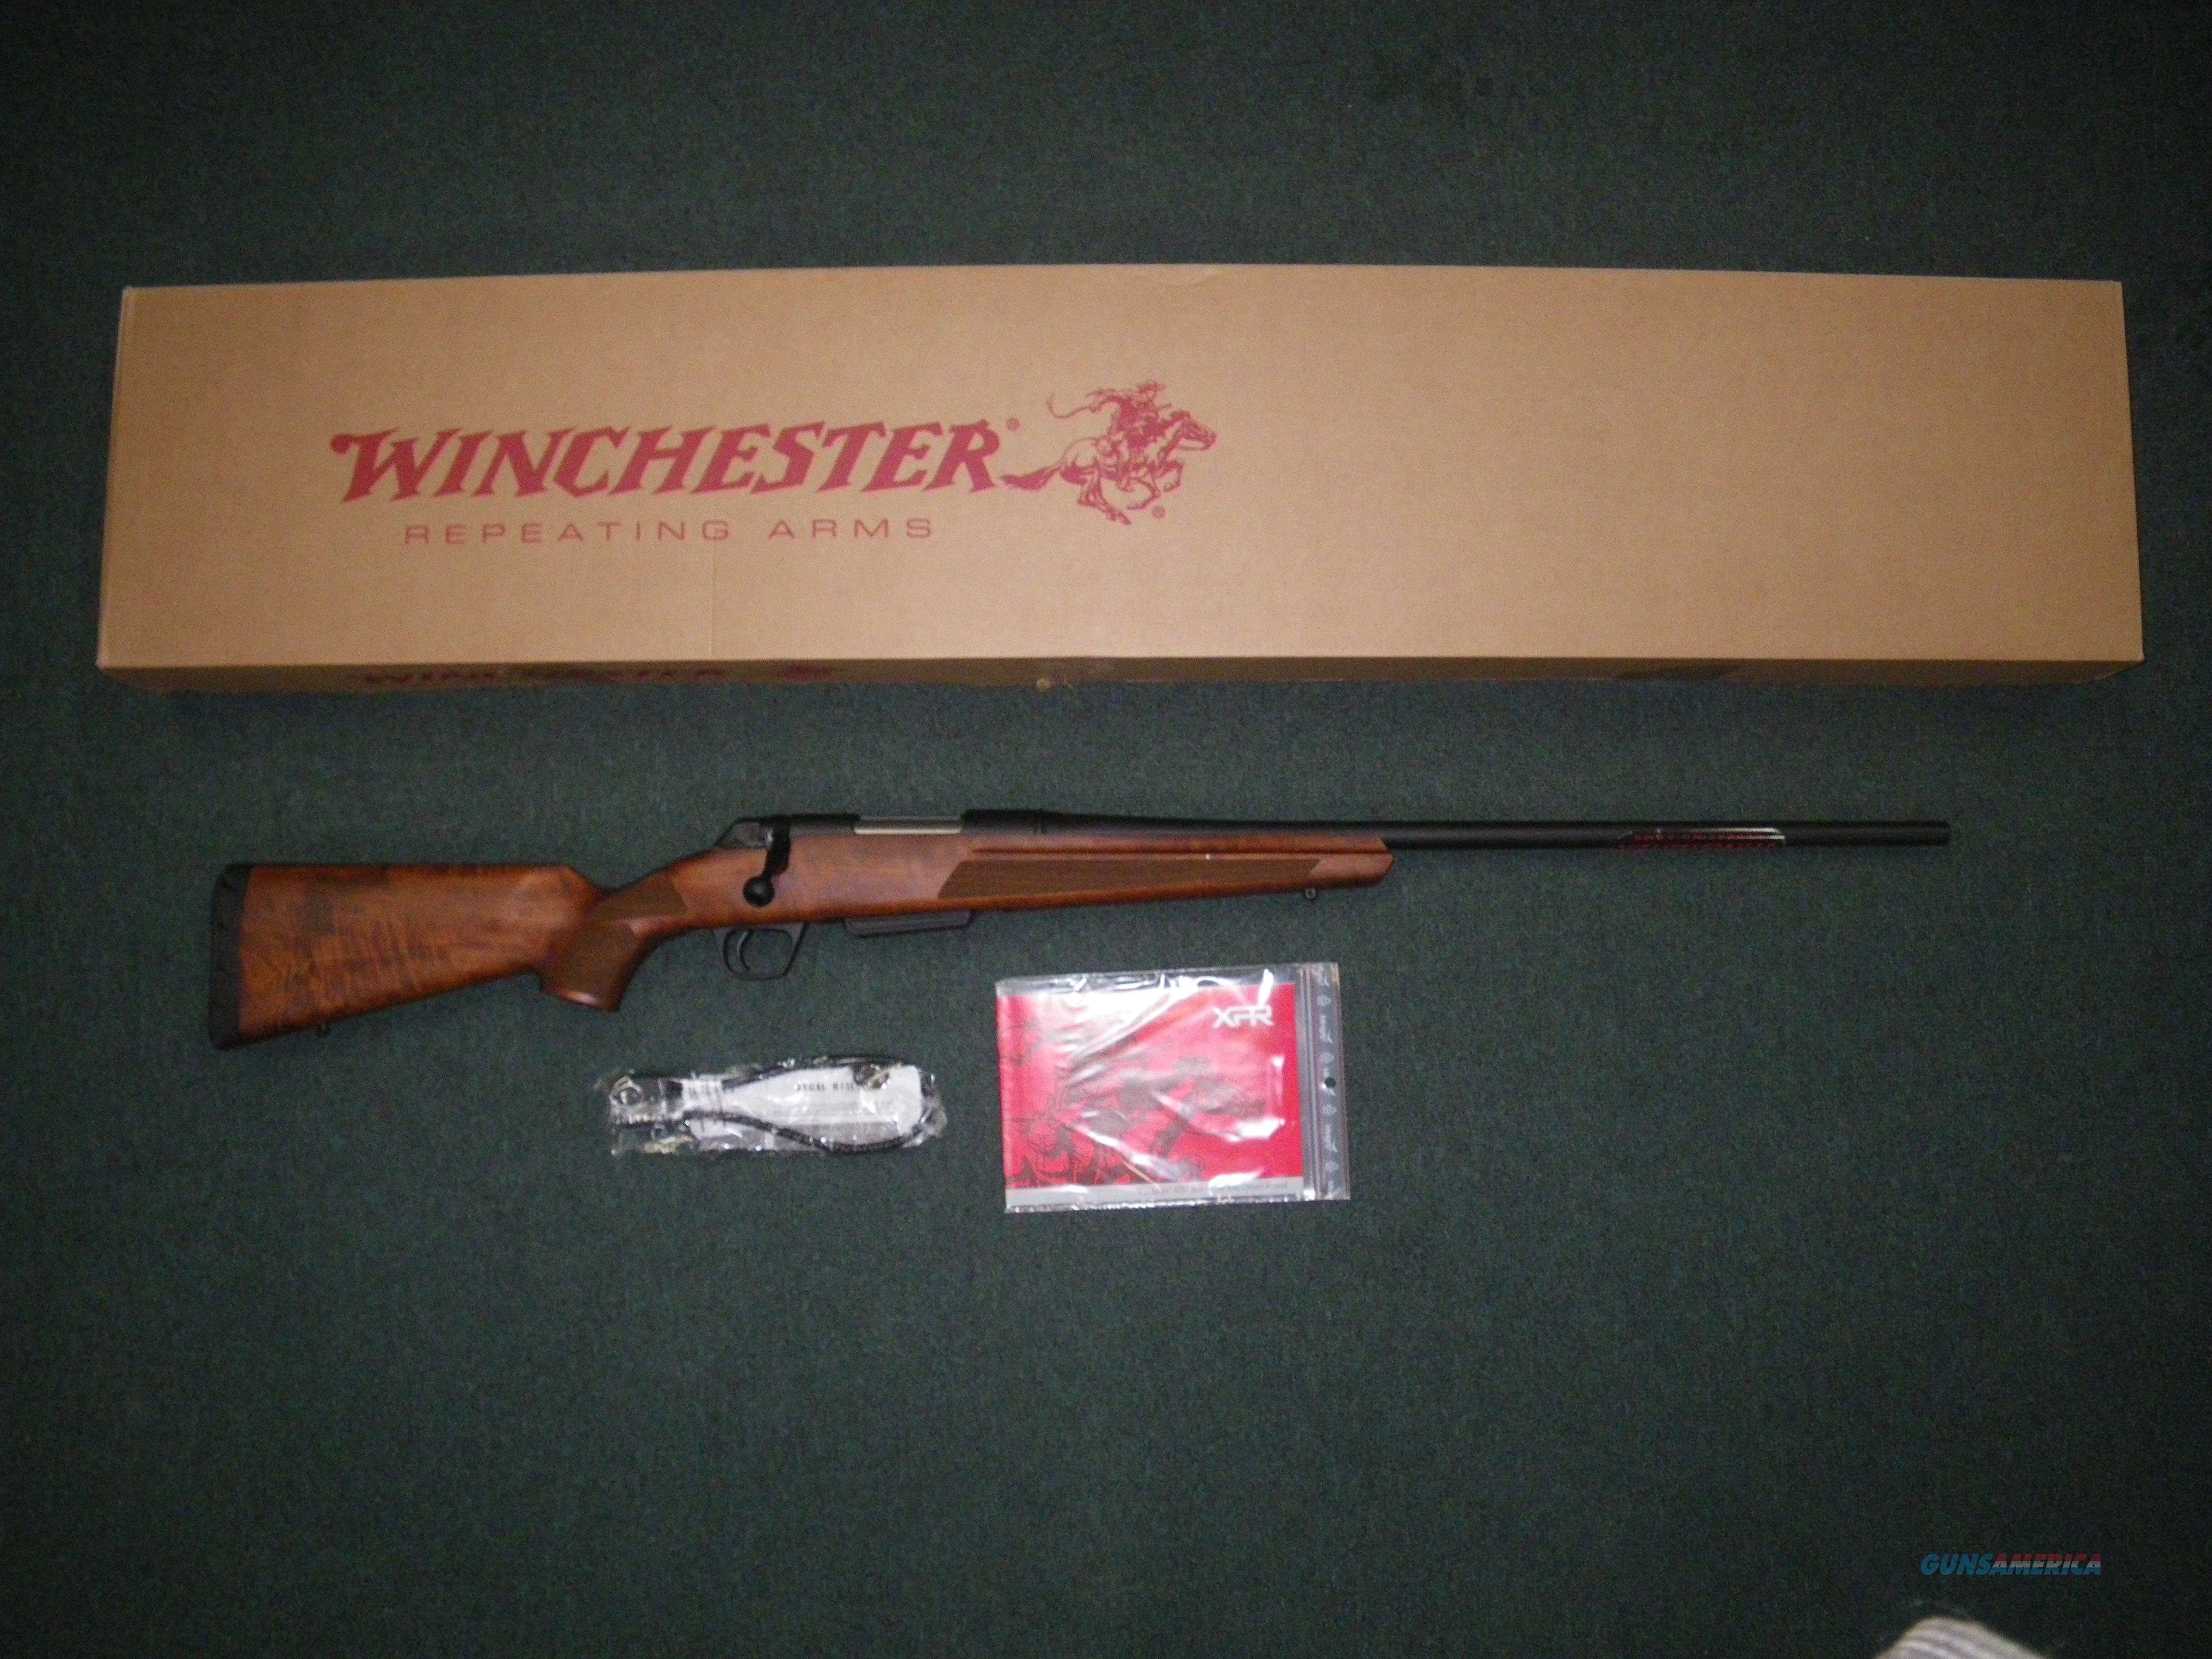 "Winchester XPR Sporter 30-06 Spfld  24"" Barrel NEW 535709228  Guns > Rifles > Winchester Rifles - Modern Bolt/Auto/Single > Other Bolt Action"